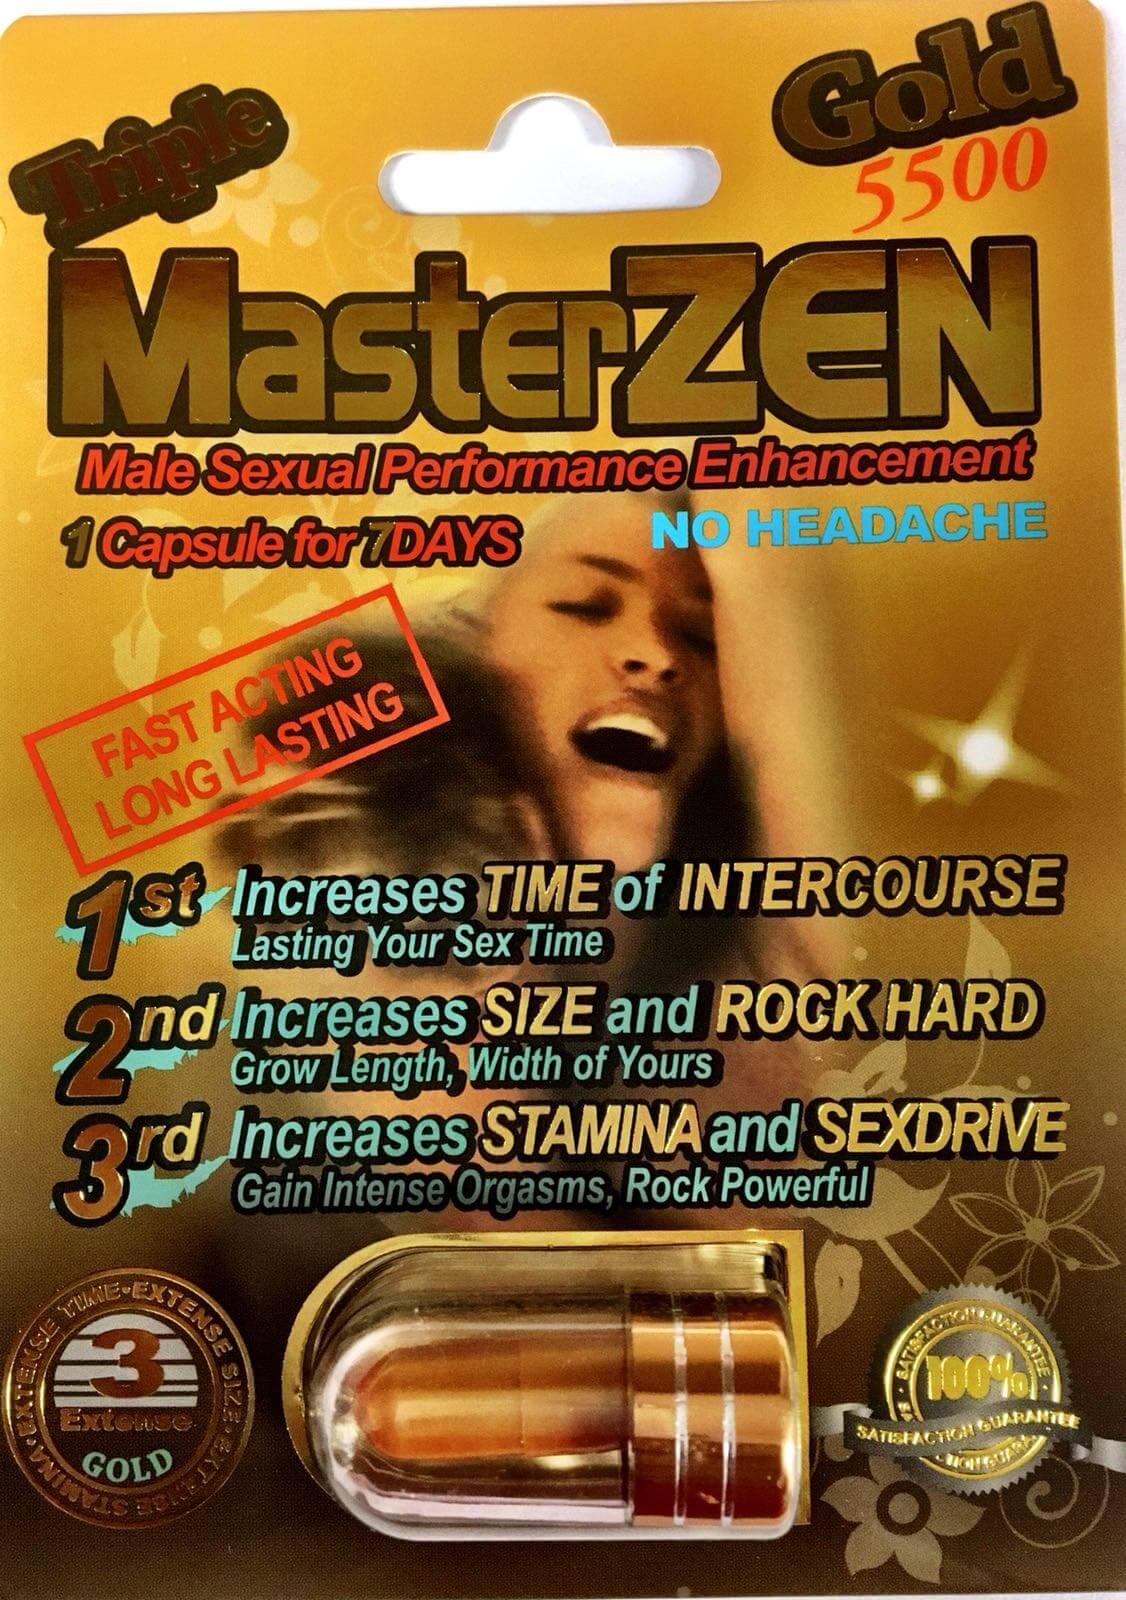 Triple Supreme Zen 3500 Reviews Just Me And Supreme